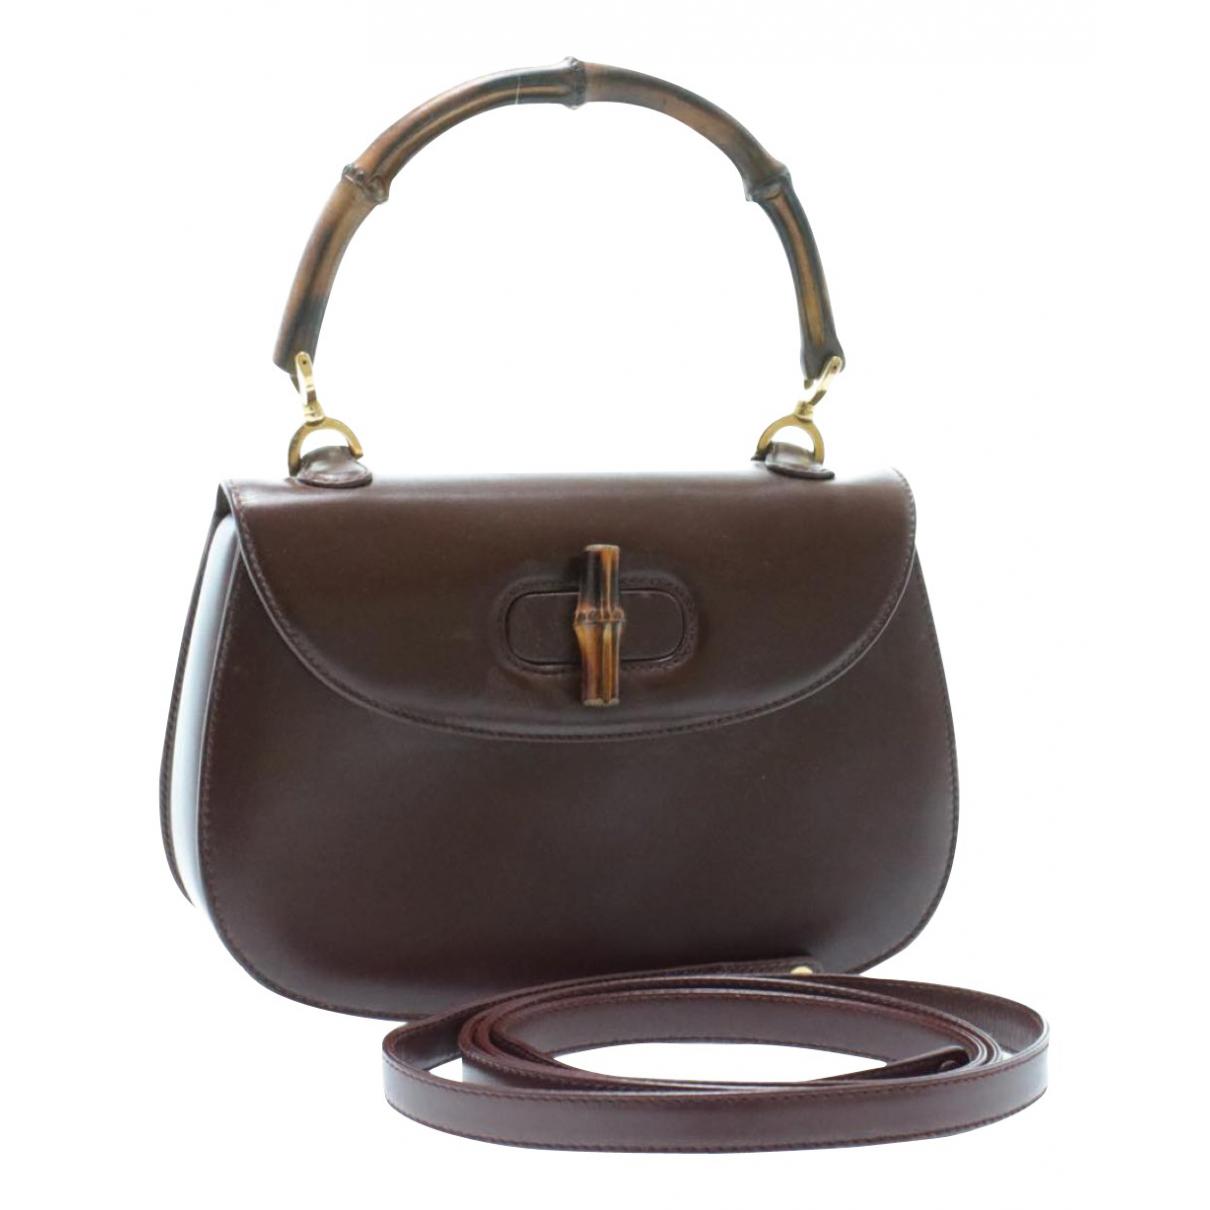 Gucci Bamboo Handtasche in  Braun Leder